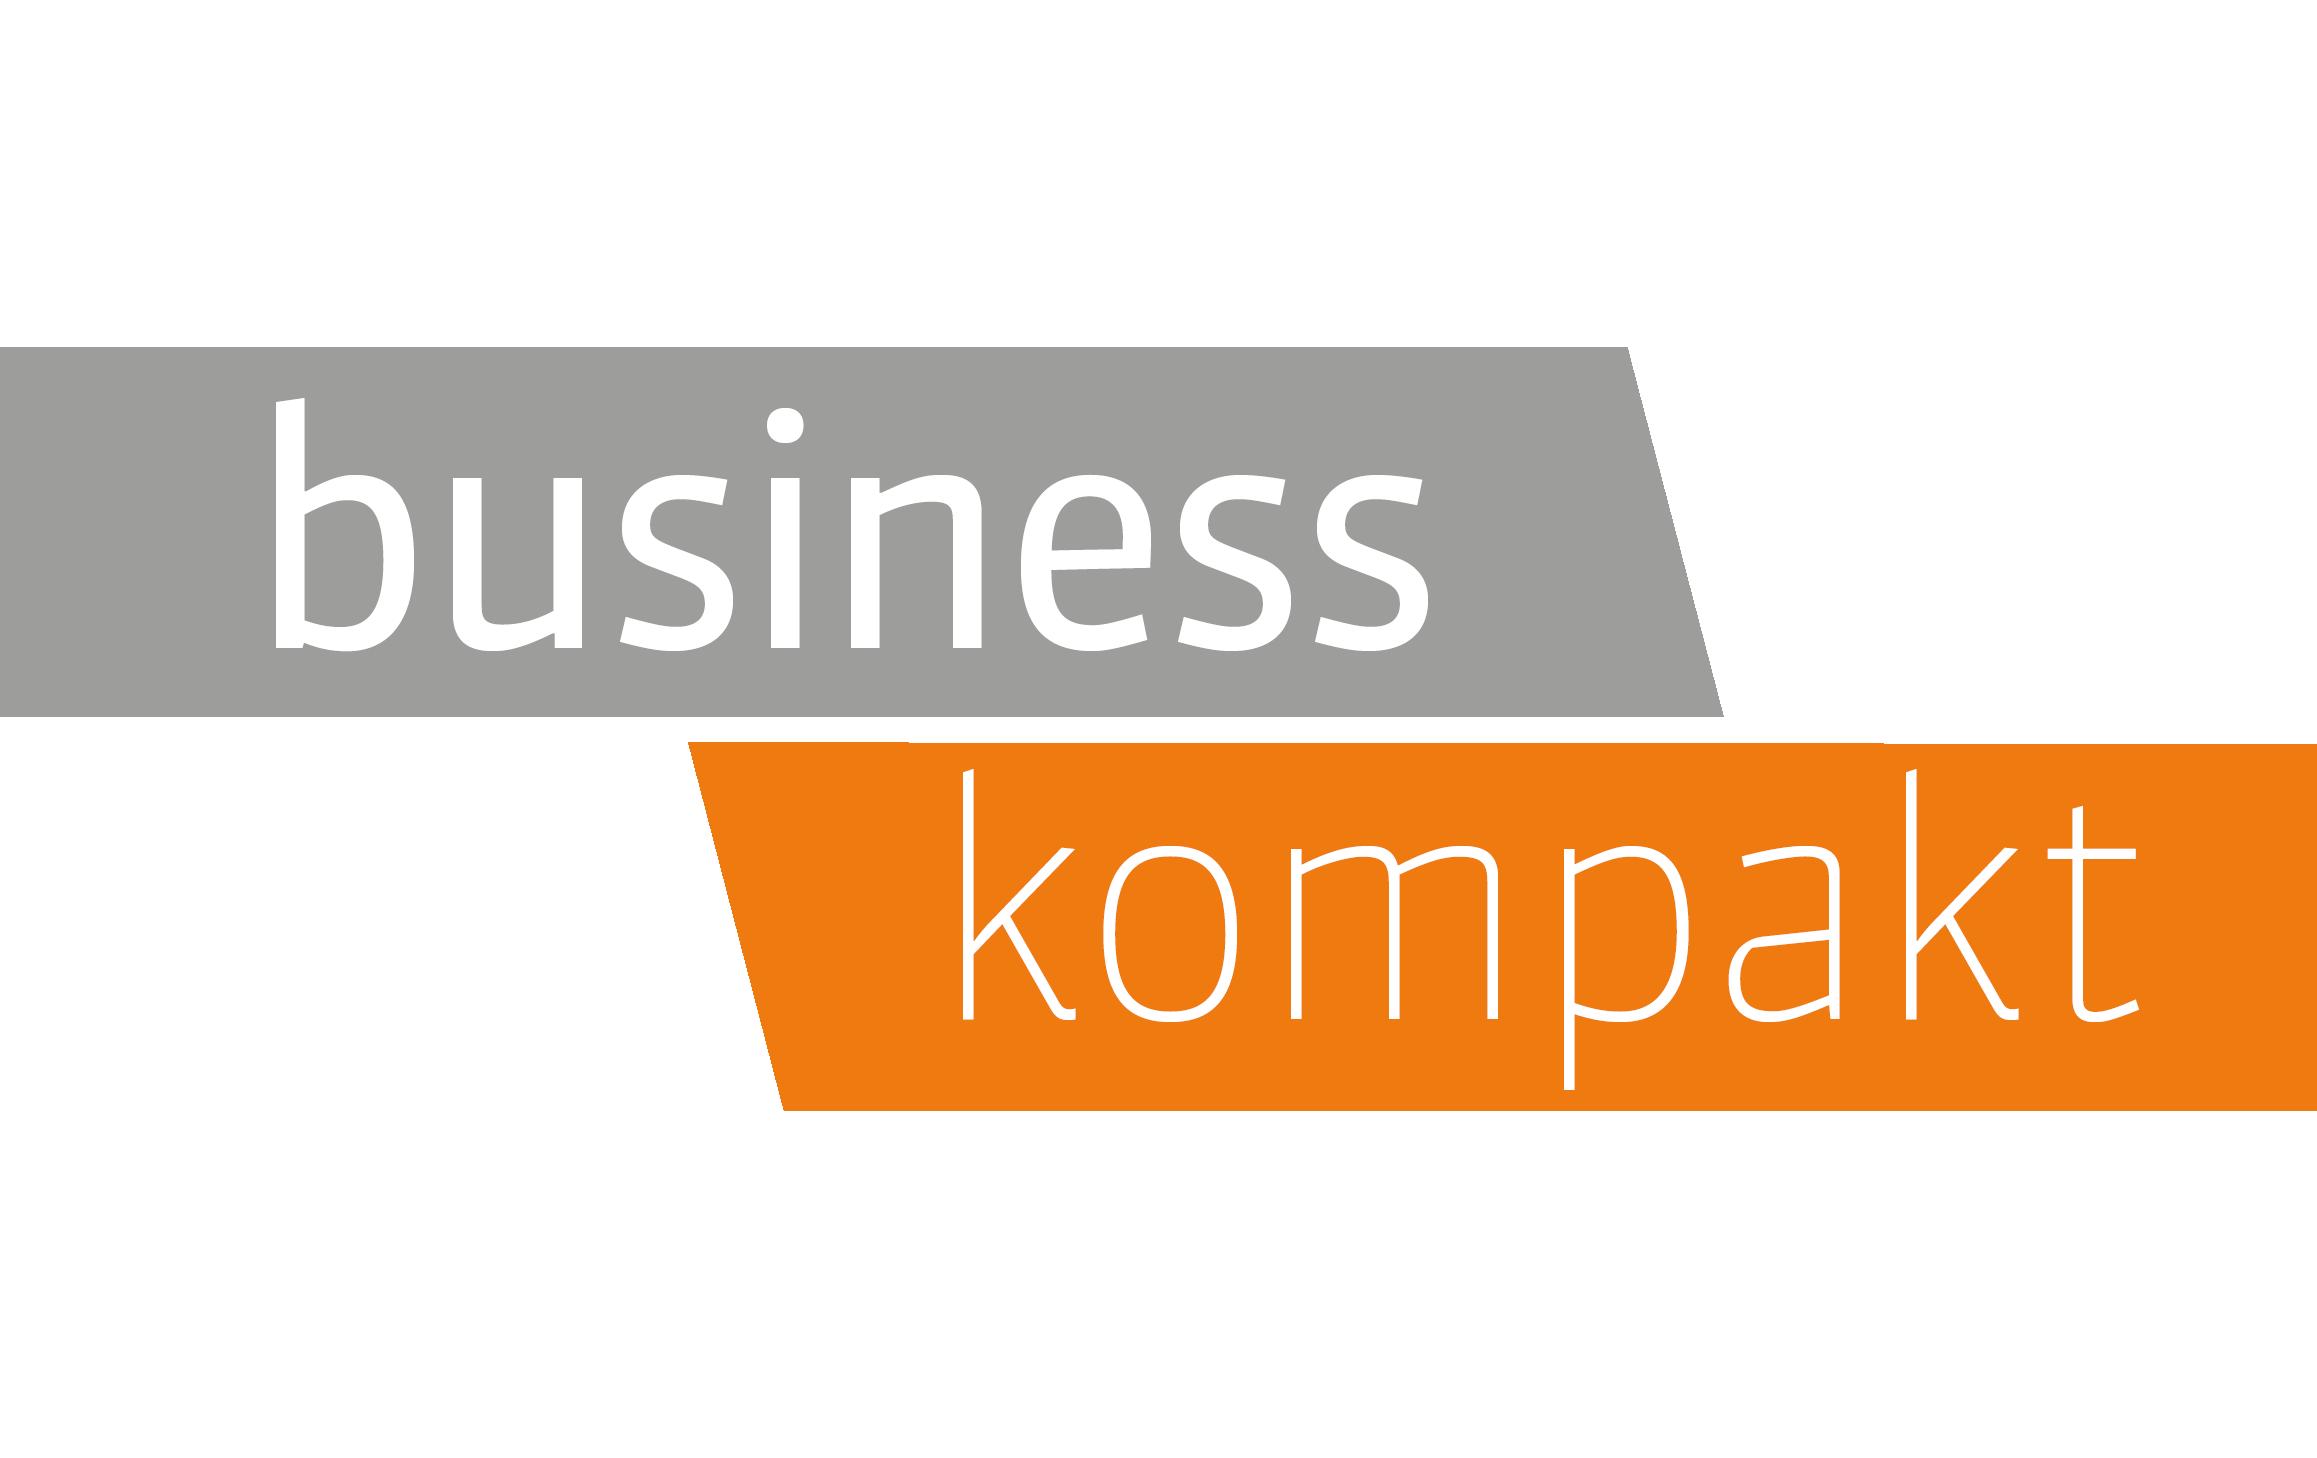 business komapkt_1112x700